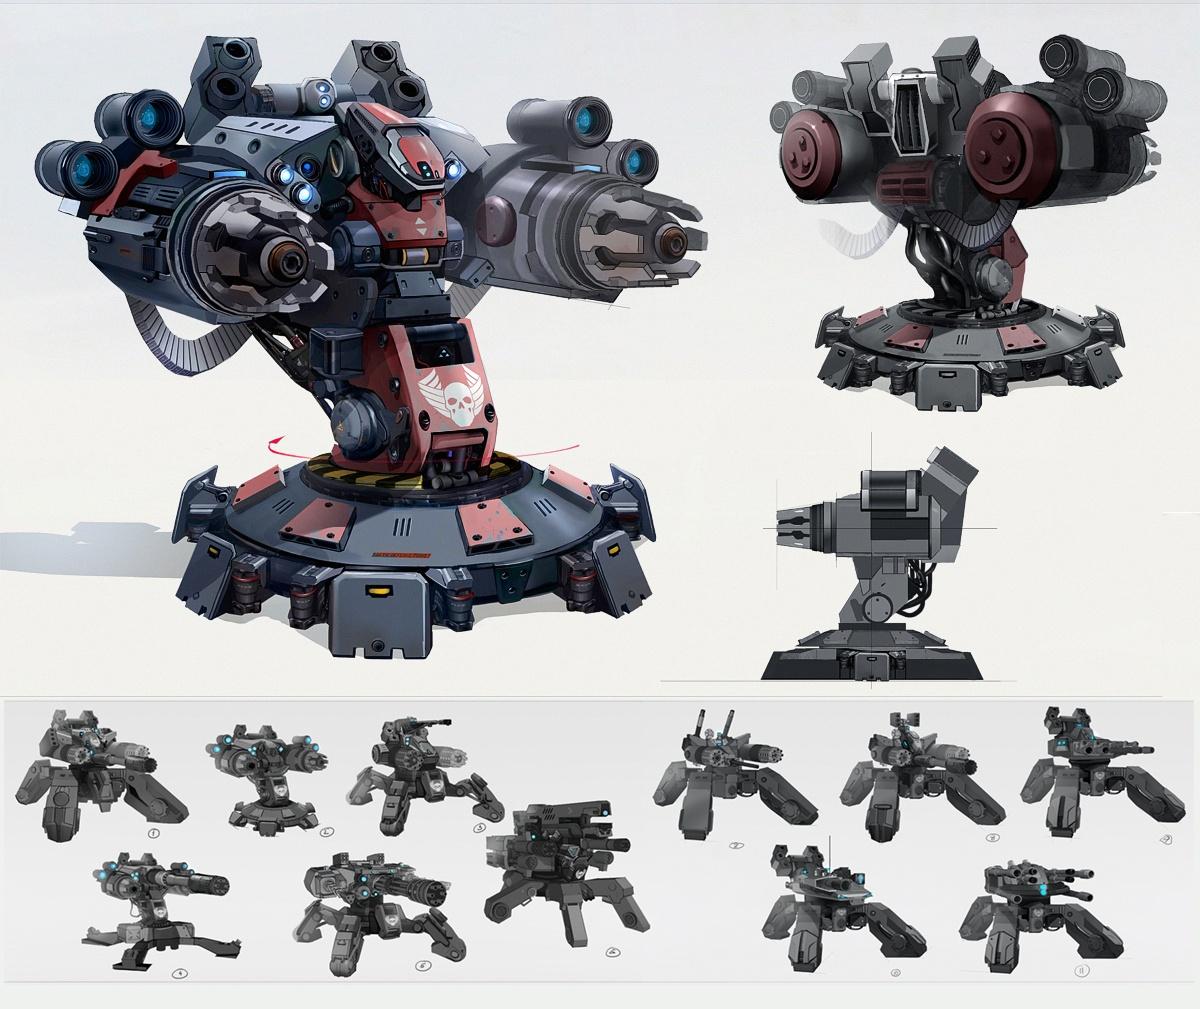 Black Hydra Turret Concept Art